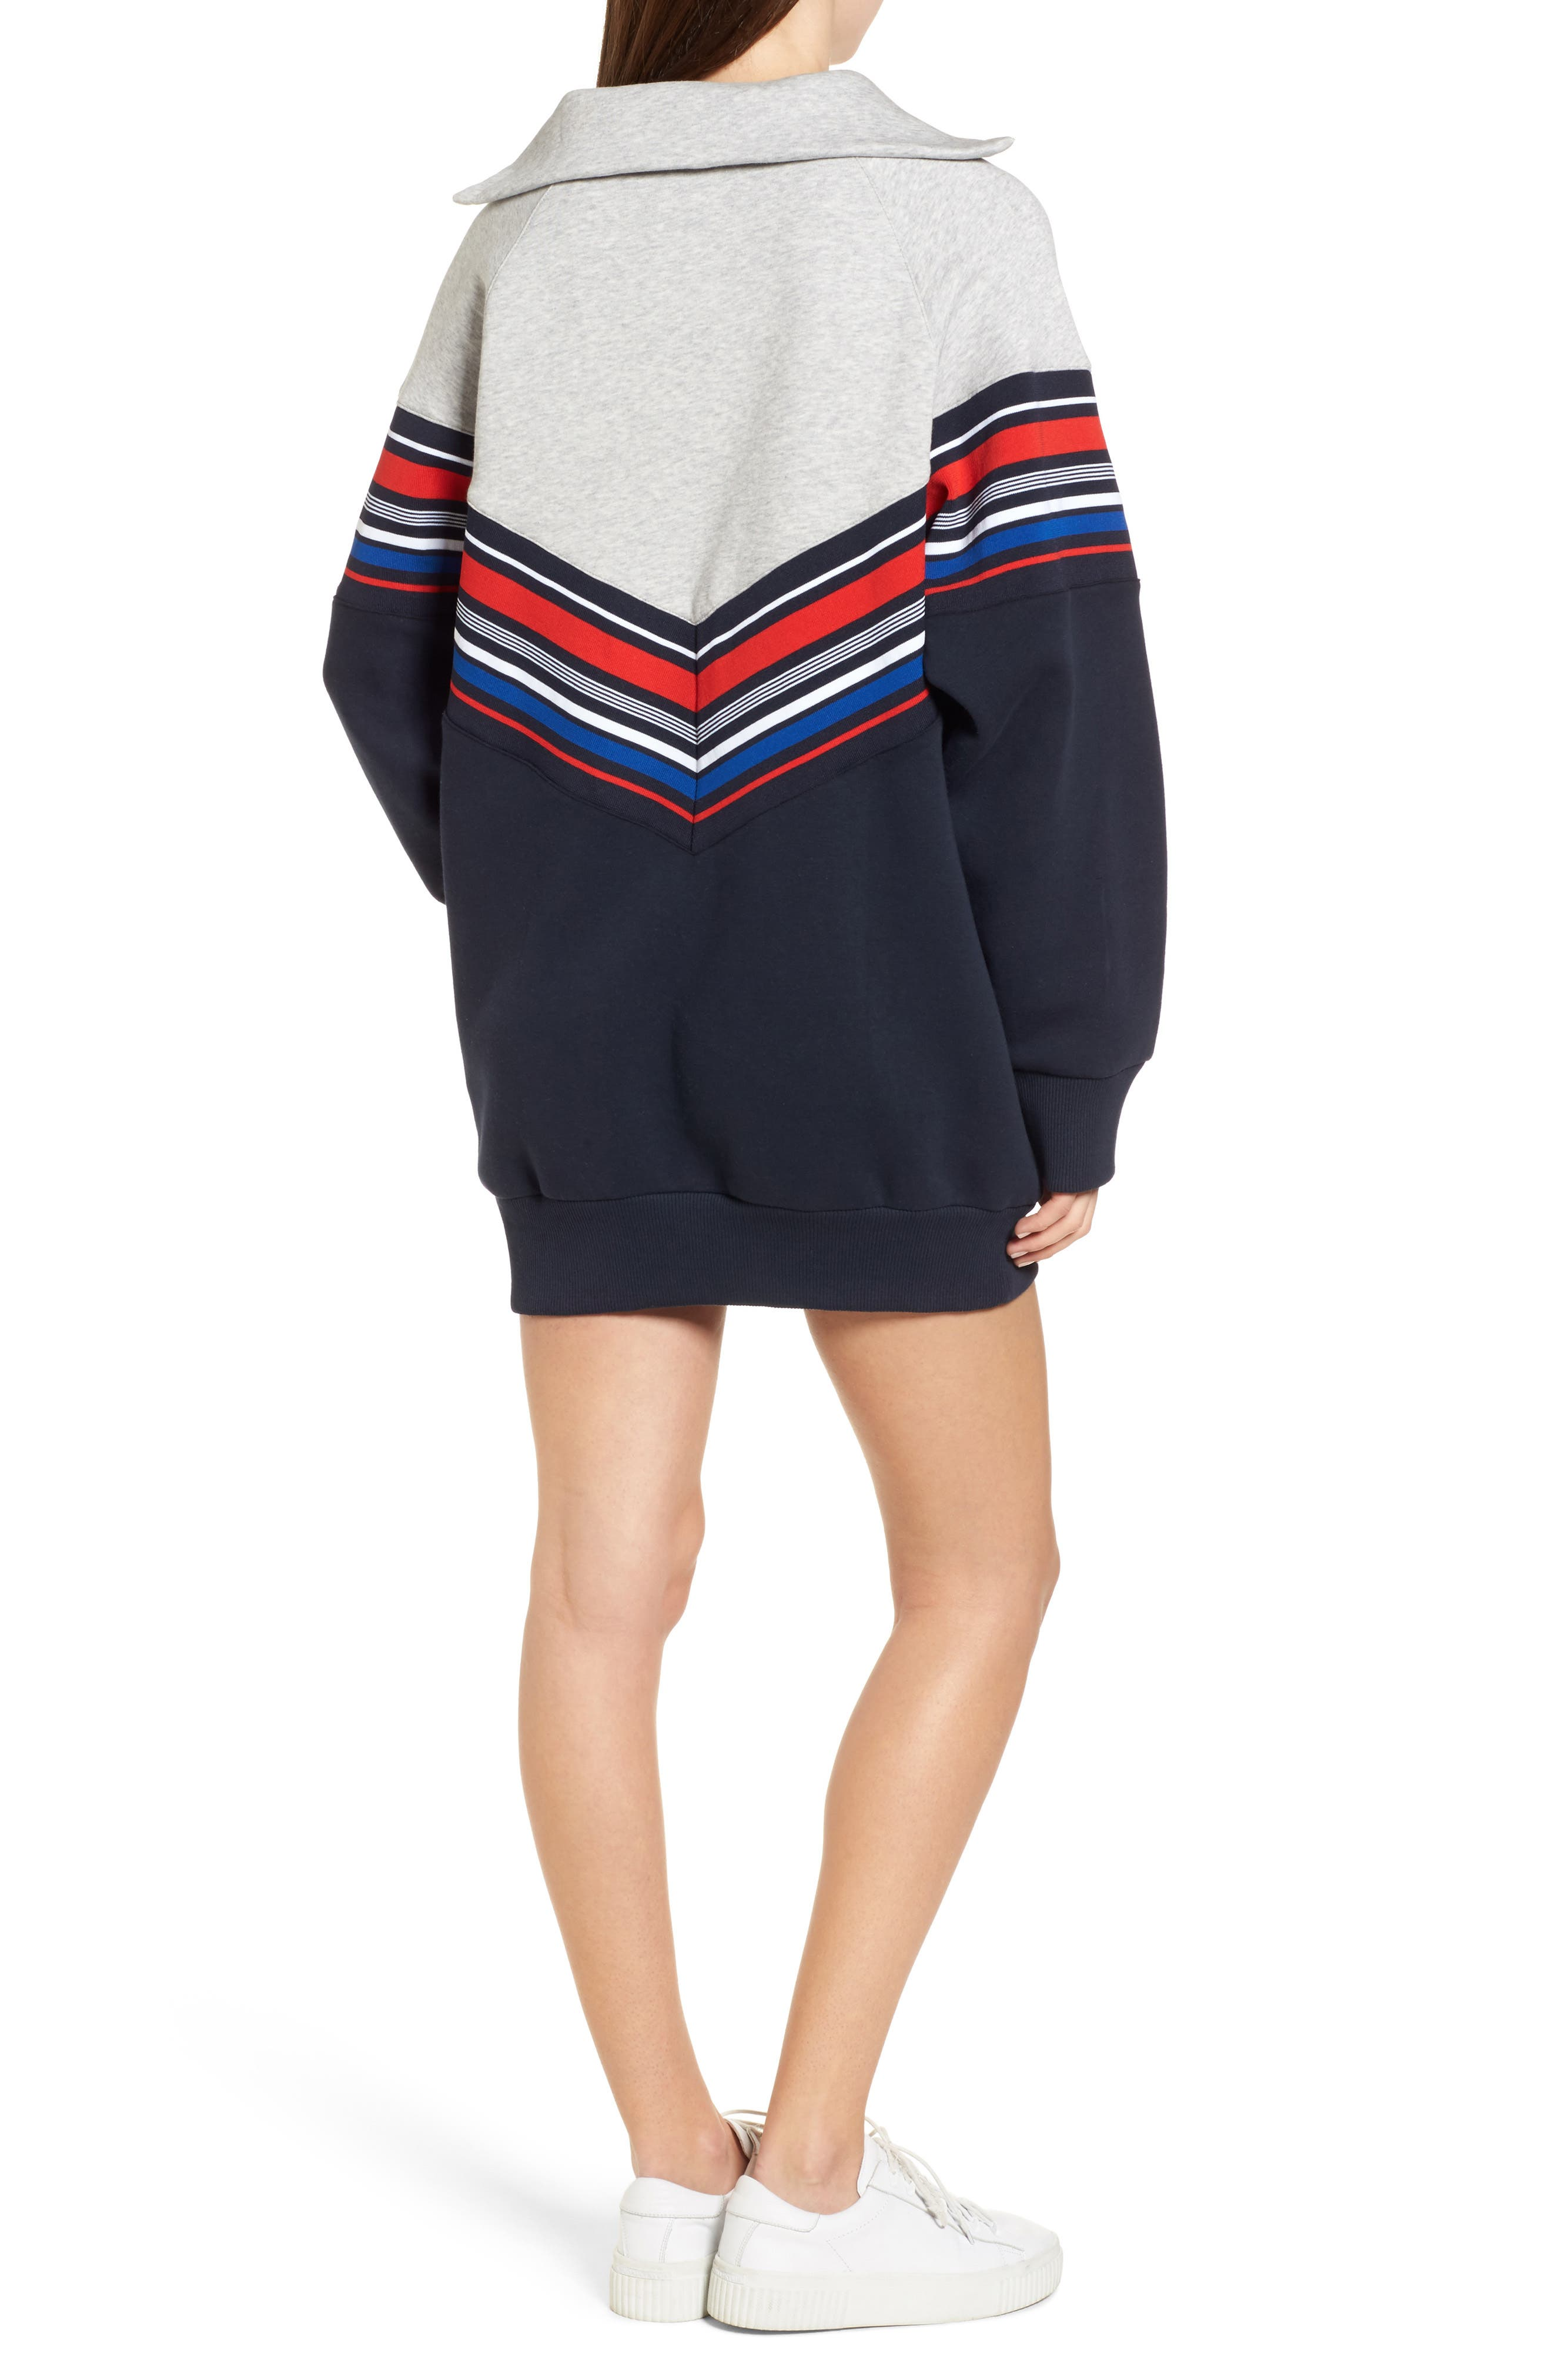 x Gigi Hadid Racing Sweatshirt Dress,                             Alternate thumbnail 2, color,                             Midnight/ Hthr